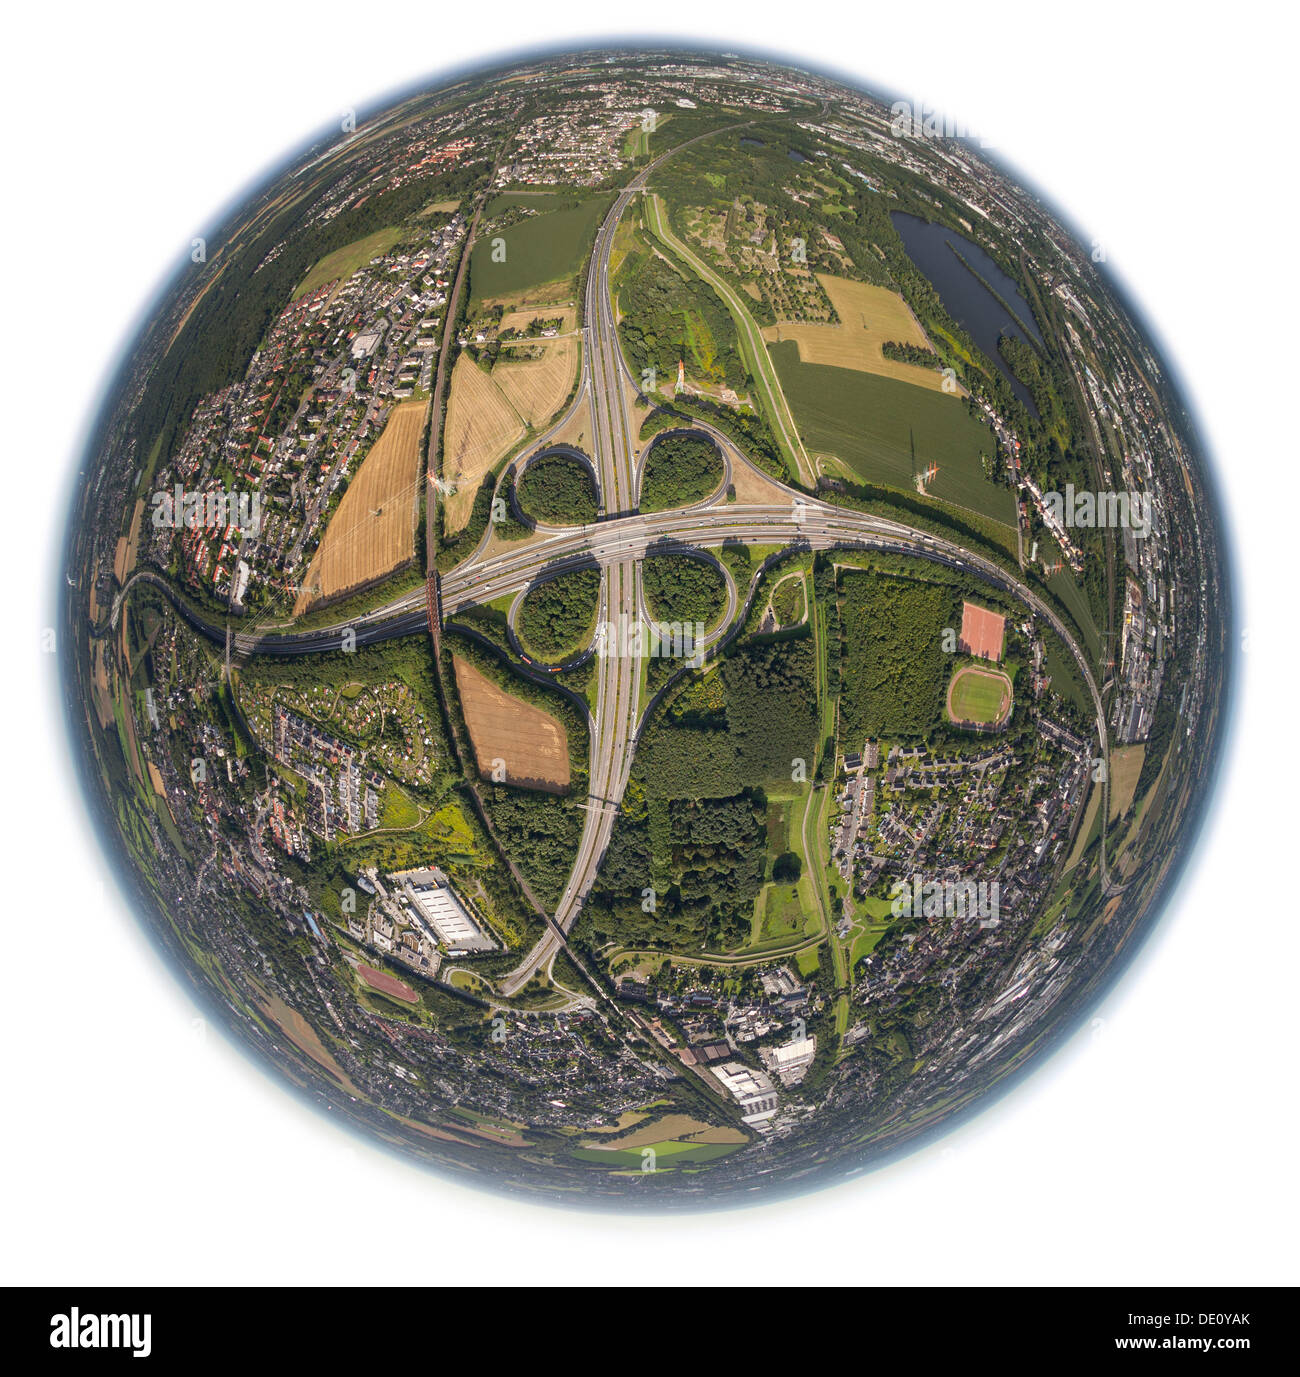 Aerial view, shot with a fisheye lens, motorway intersection, Dortmund, Ruhr area, North Rhine-Westphalia - Stock Image